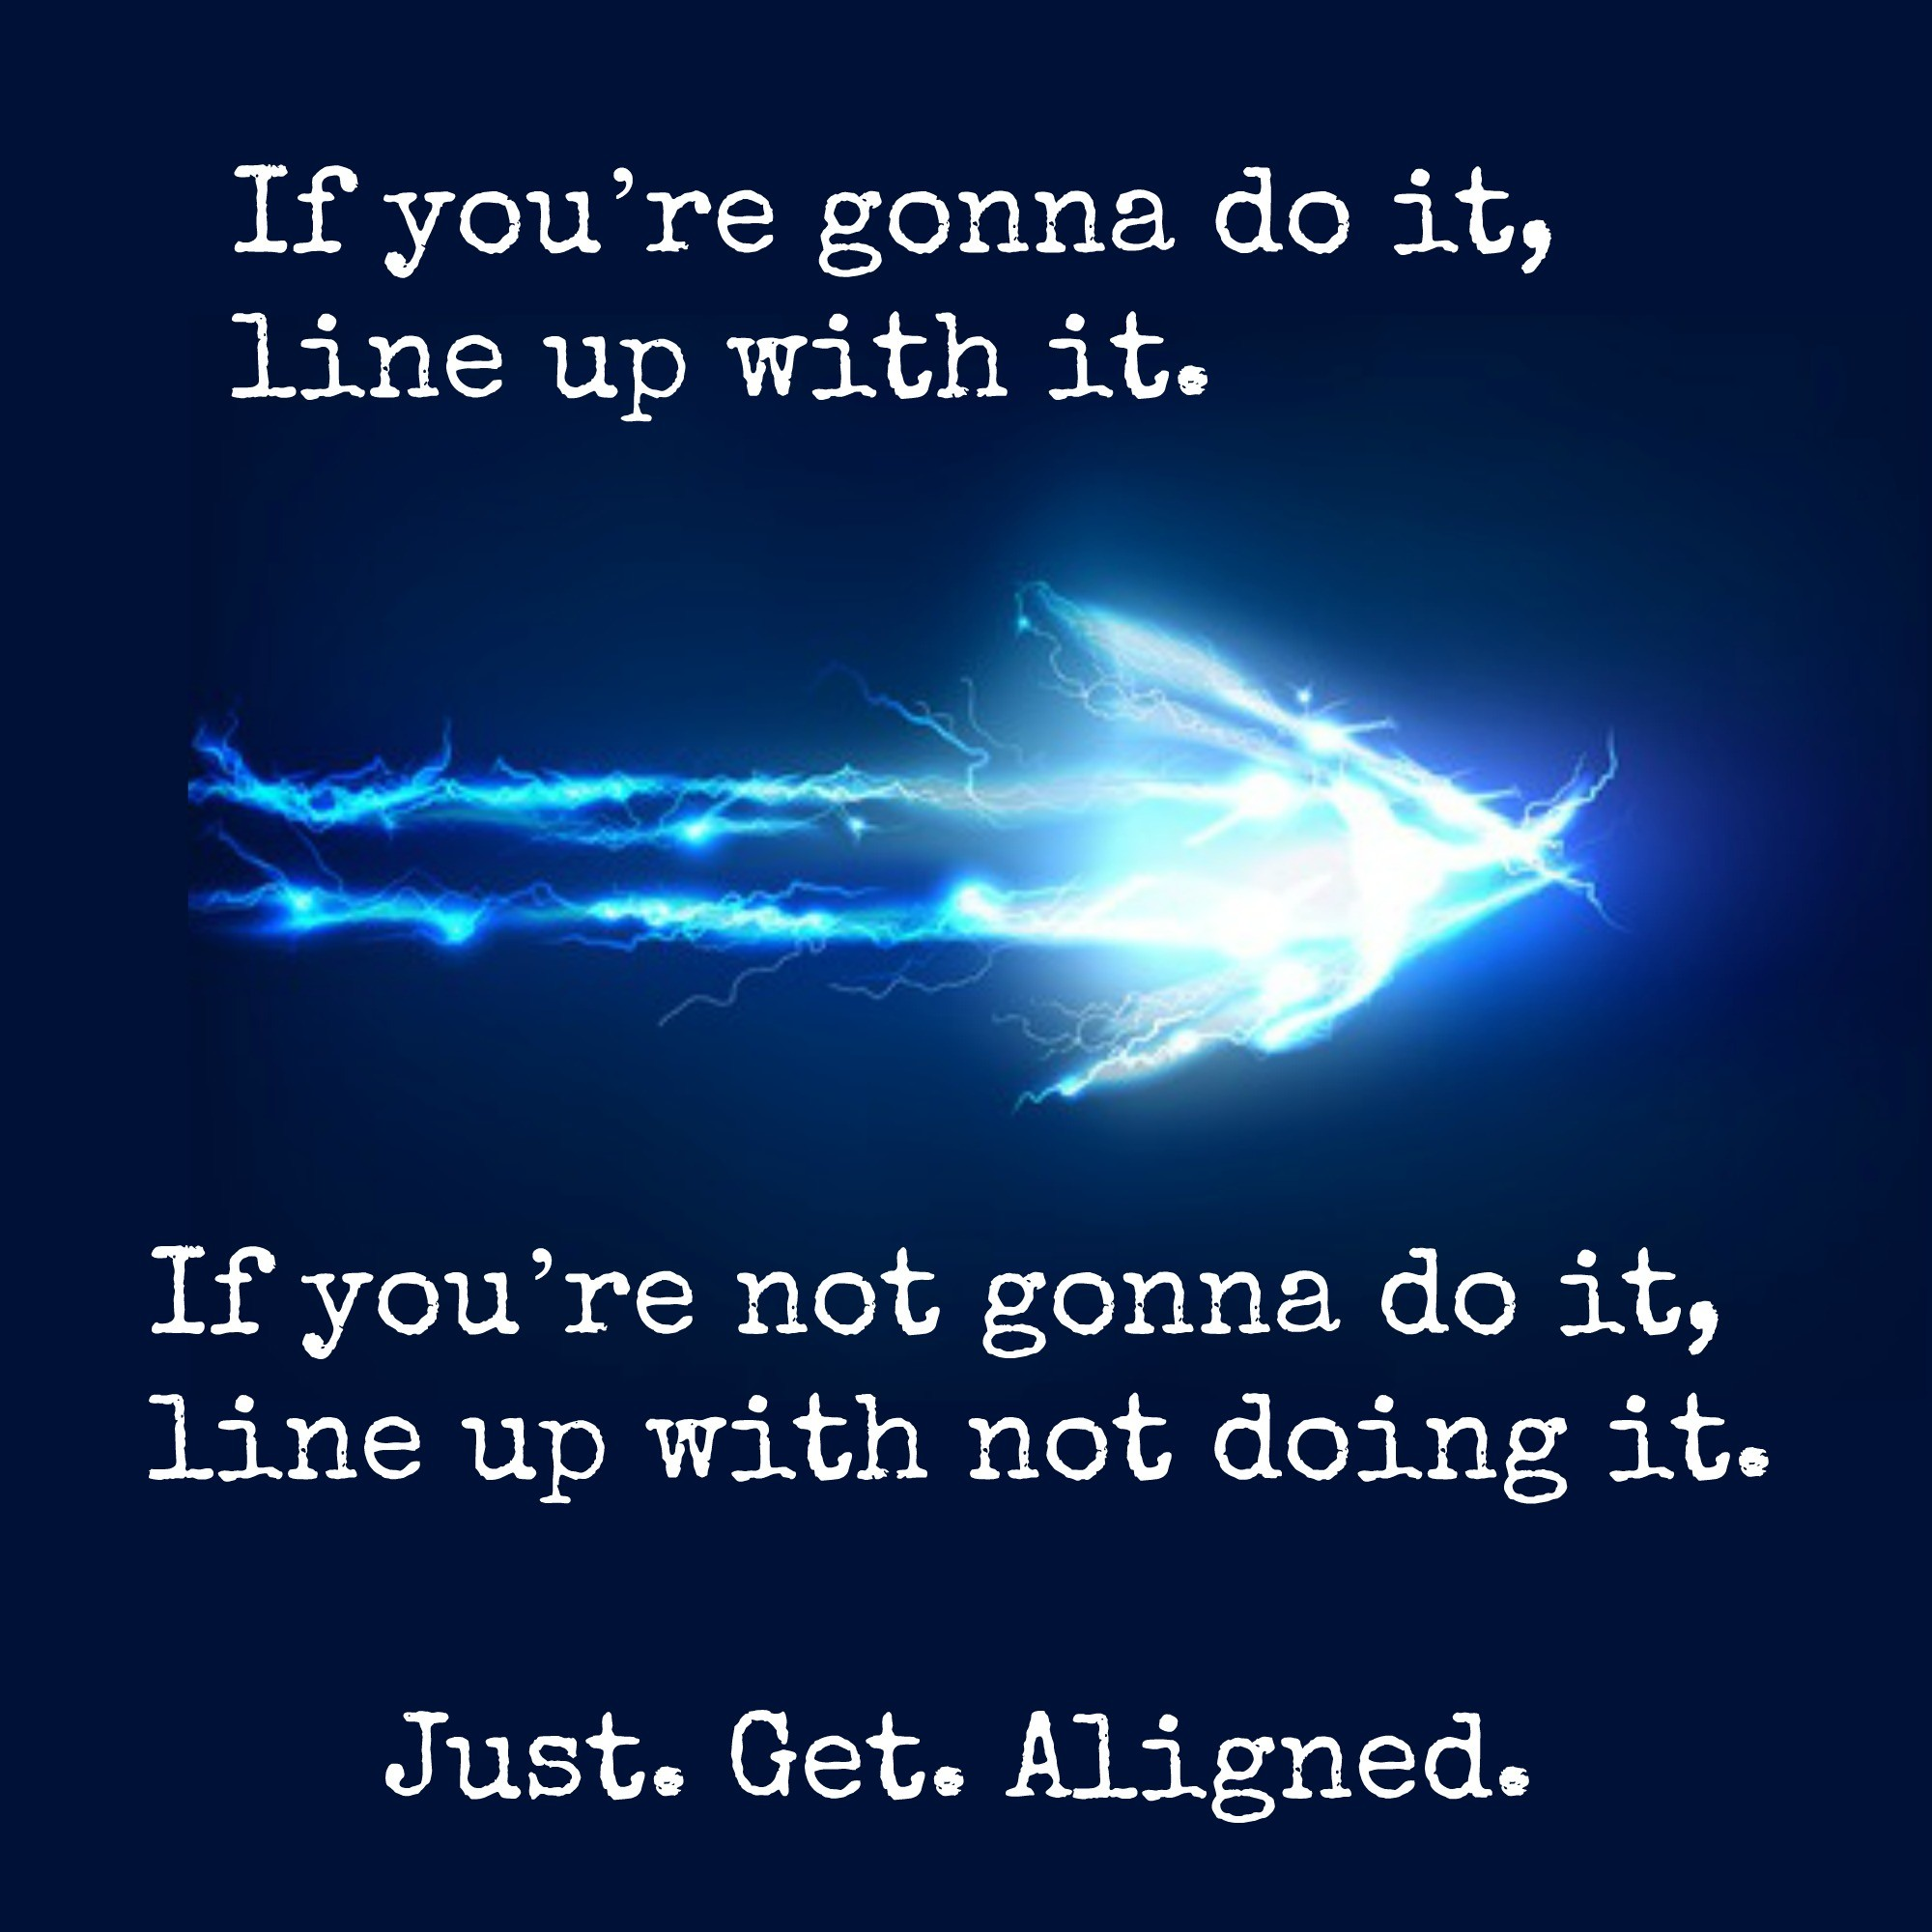 Just Get Aligned.